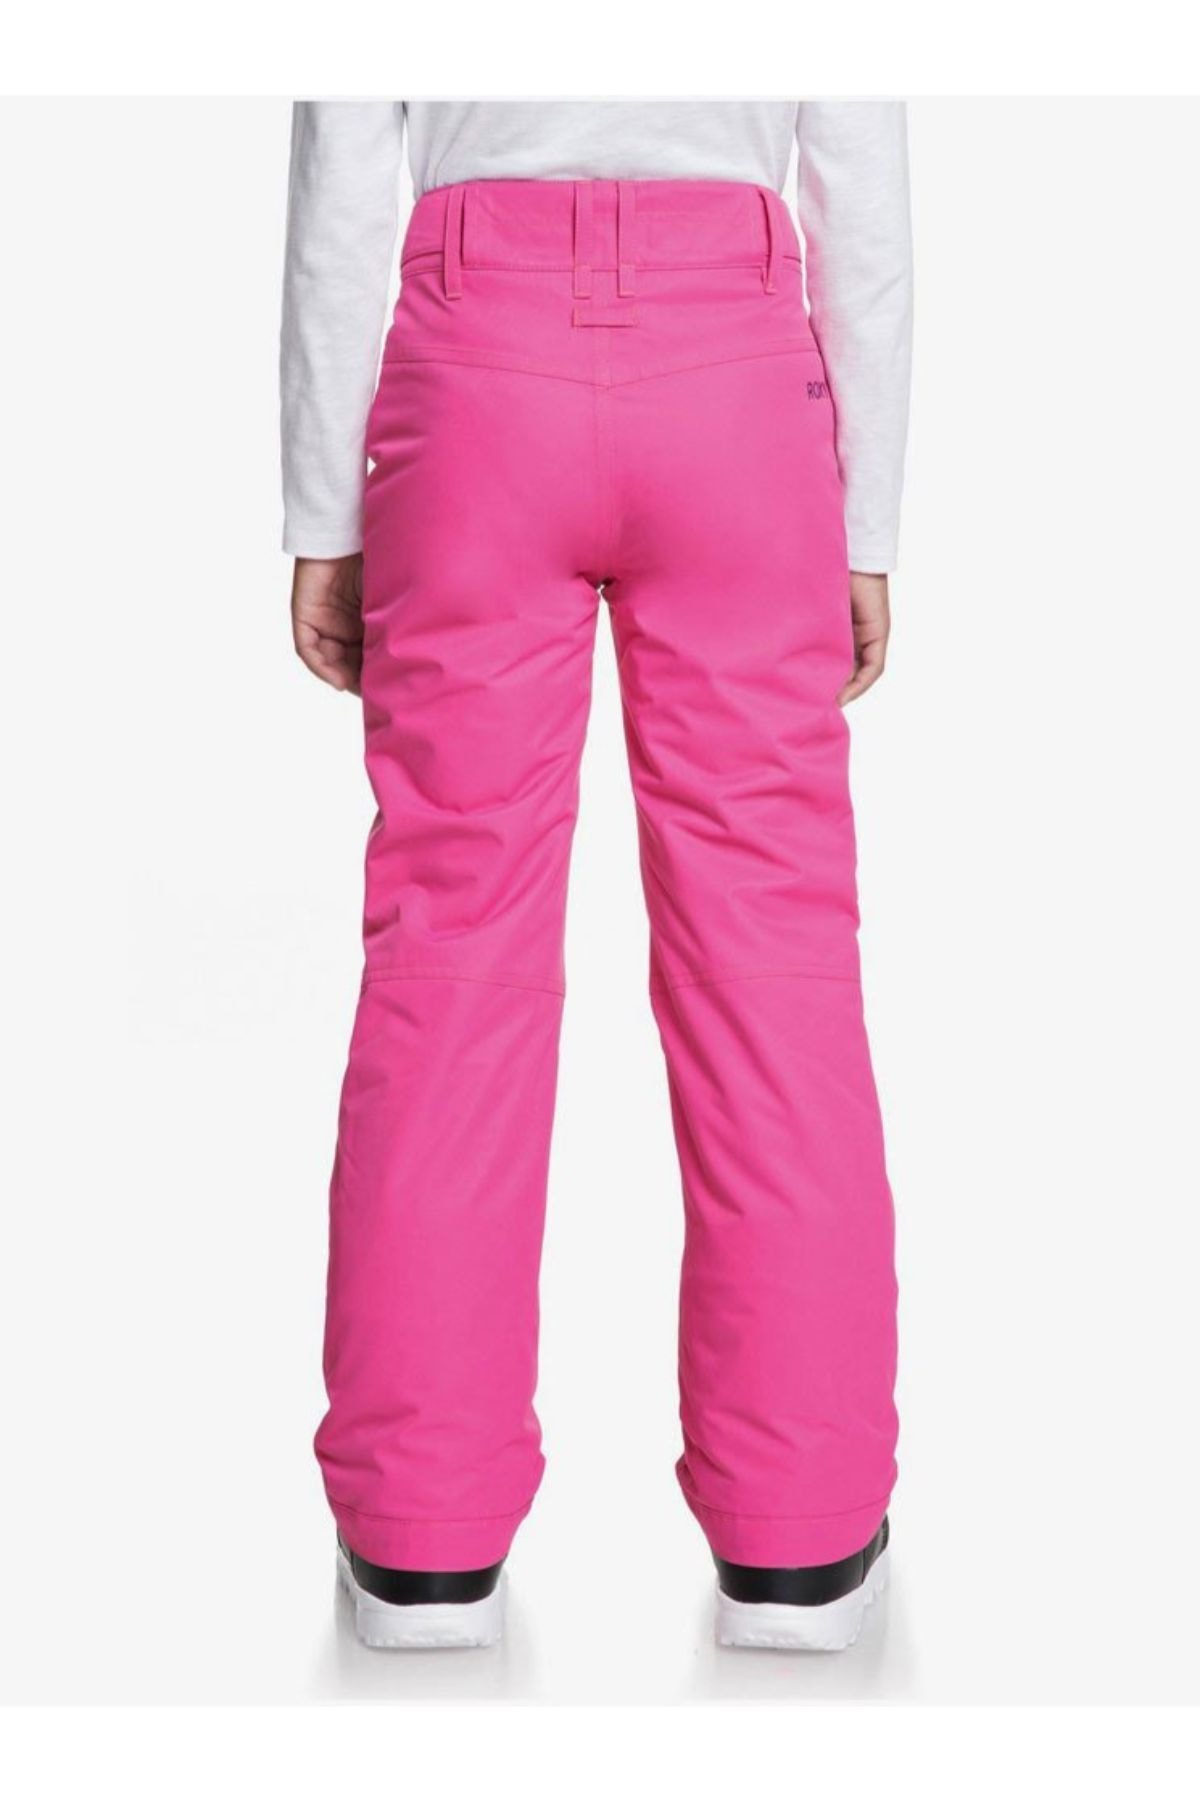 Roxy Backyard Kız Çocuk Kayak Pantolonu ERGTP03021NML0 2